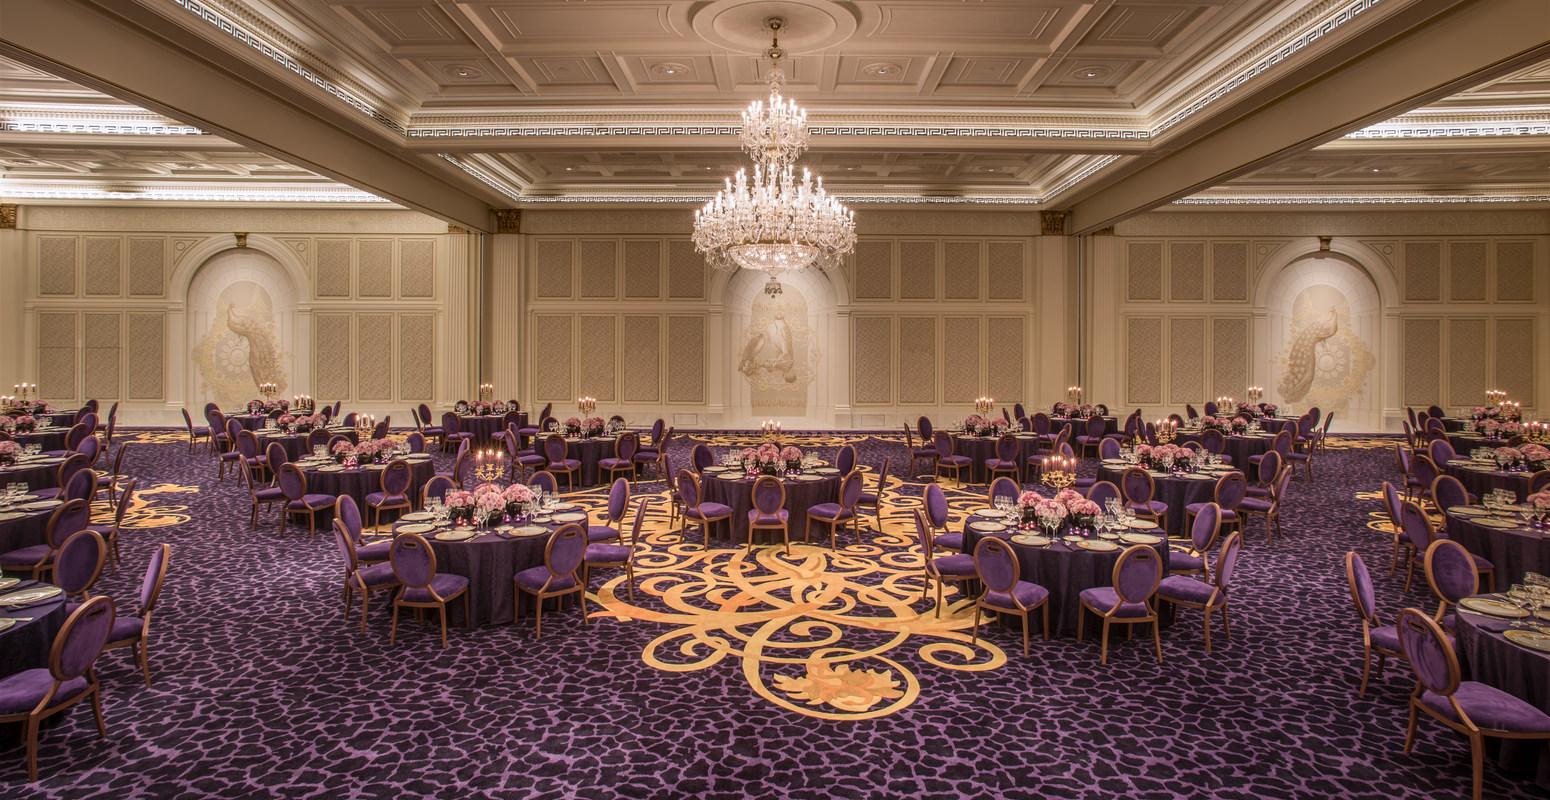 new_meetings-__thumbs_1550_800_crop-ballroom